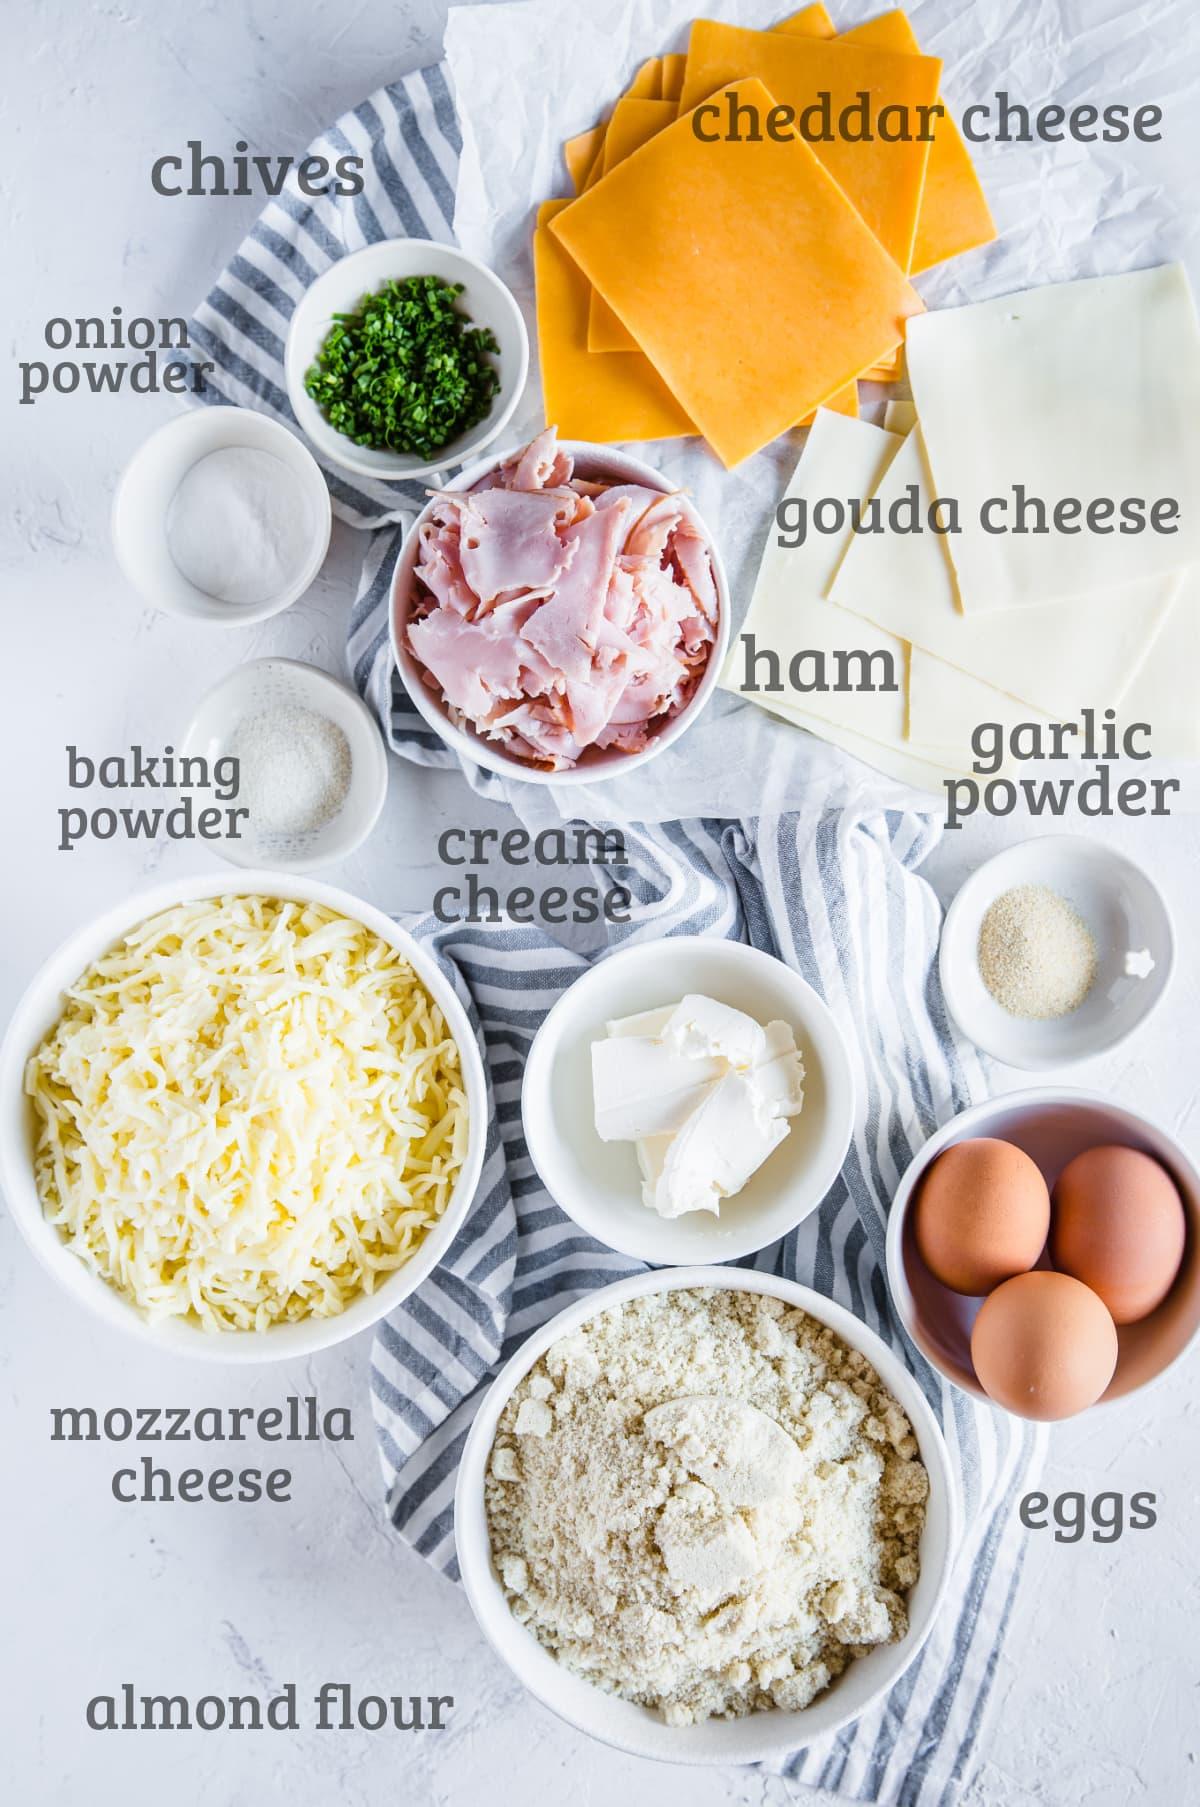 Ingredients laid out for keto hot pockets - cheddar, gouda, chives, ham, almond flour, eggs, cream cheese, mozzarella cheese, garlic powder, onion powder.